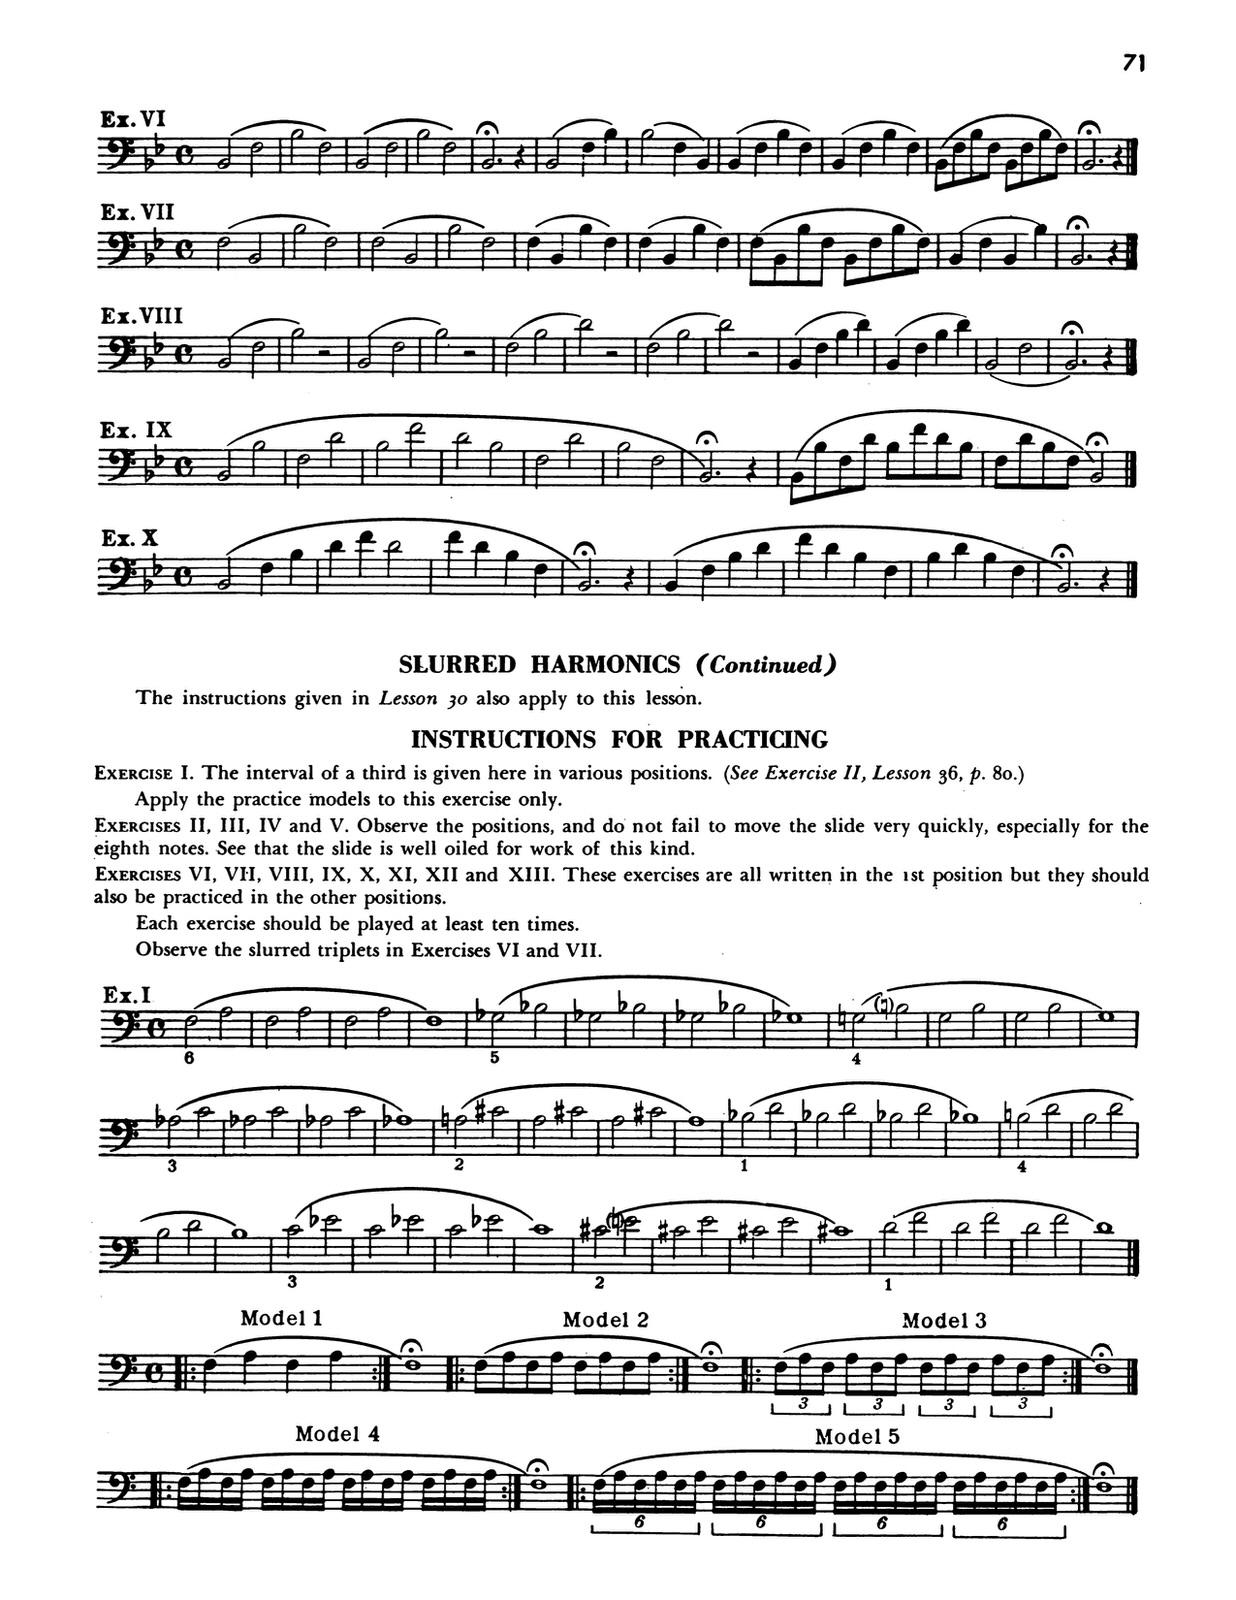 Clean Dorsey, The Modern Trombonist 7